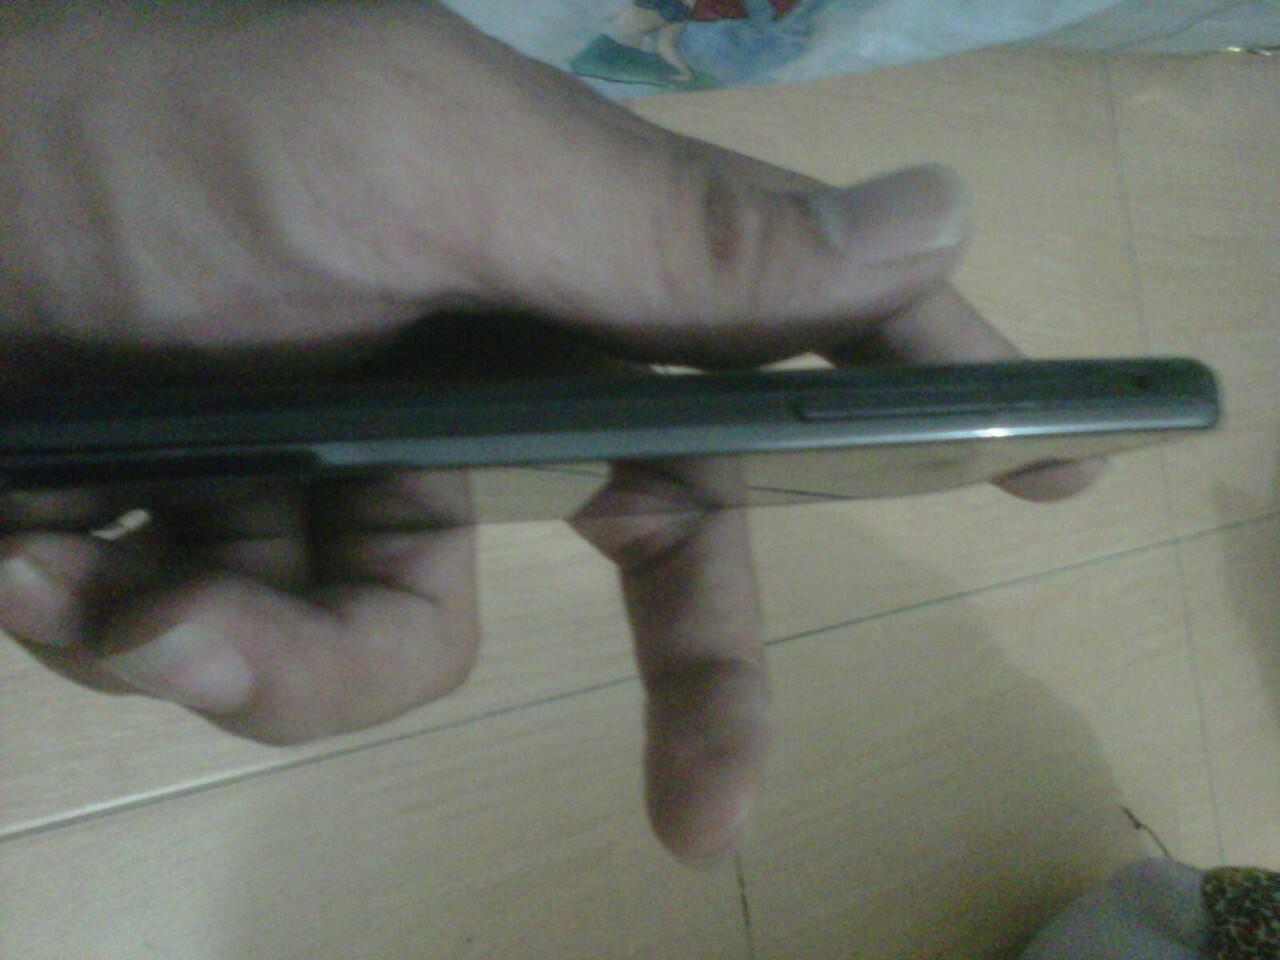 Samsung Galaxy S II black mulus (pekanbaru)